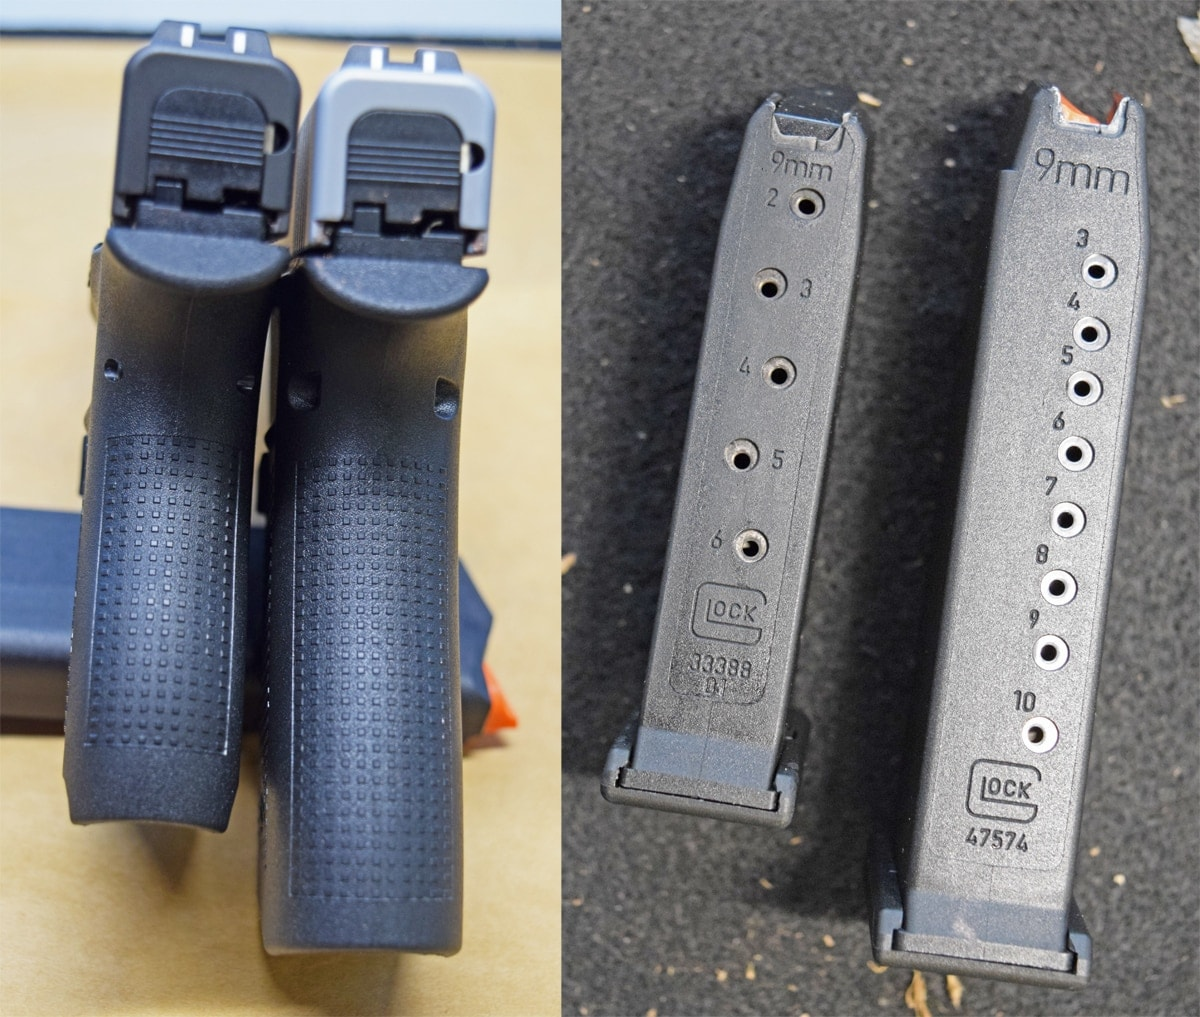 Glock 43, Glock 43x, handgun